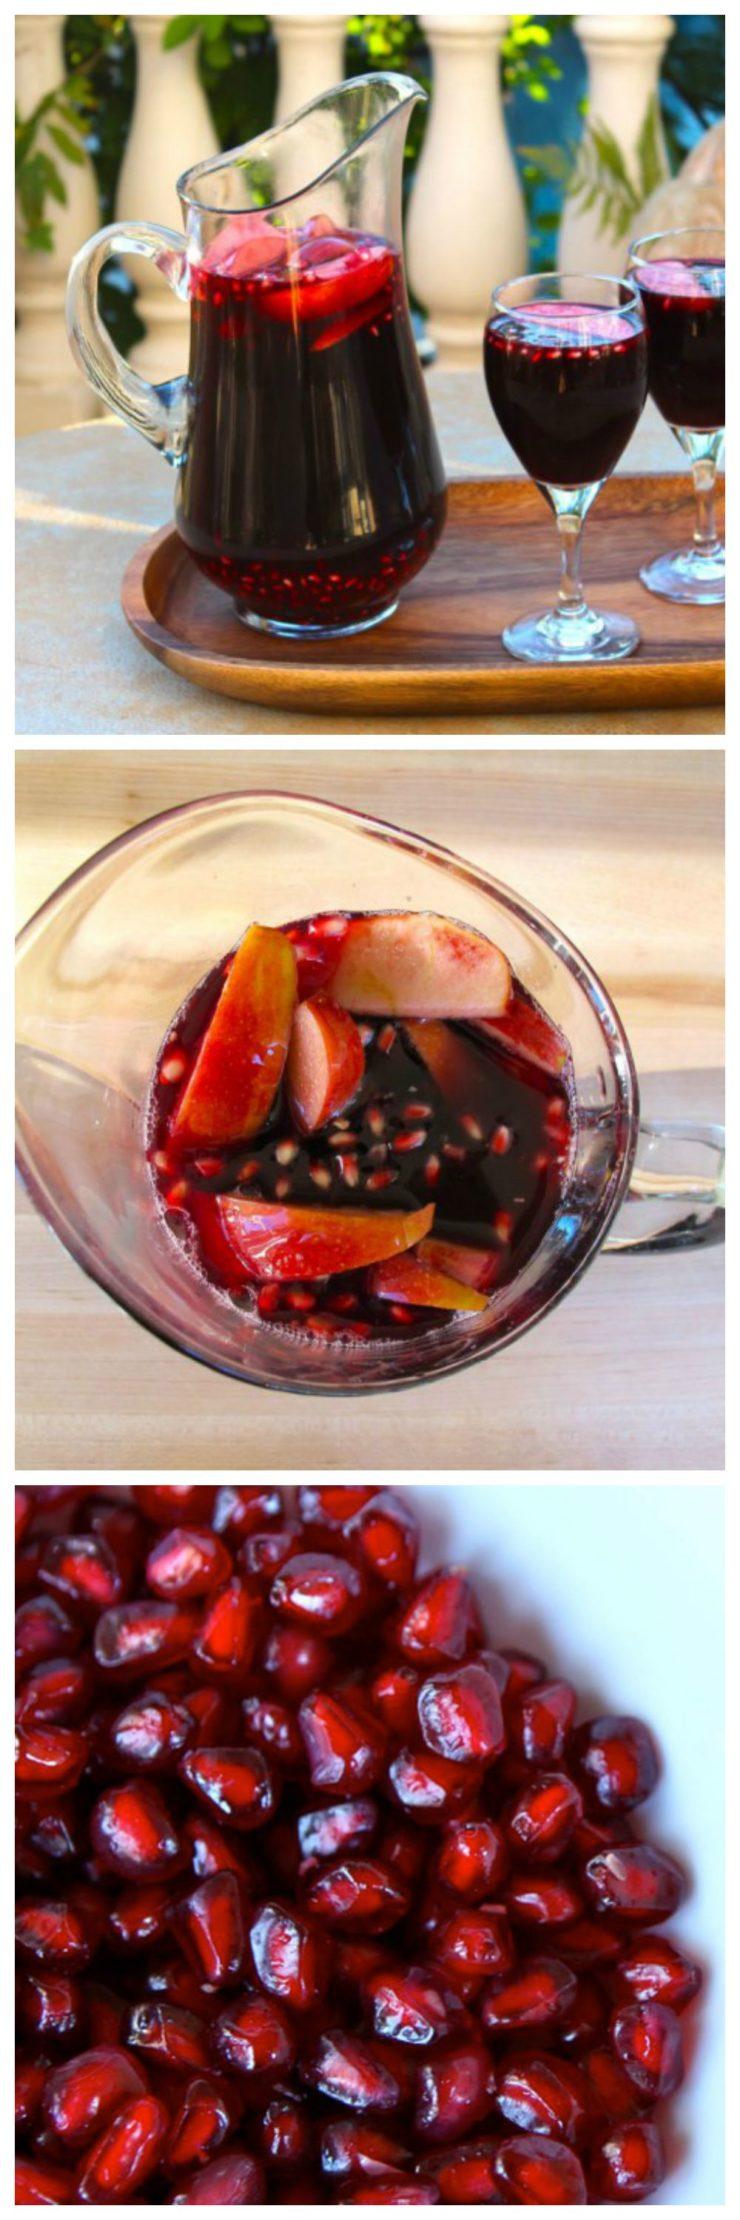 Rosh Hashanah Sangria - Sweetly symbolic sangria recipe for the High Holidays with red wine, pomegranate juice, apple, grapes and honey. Shana Tova!